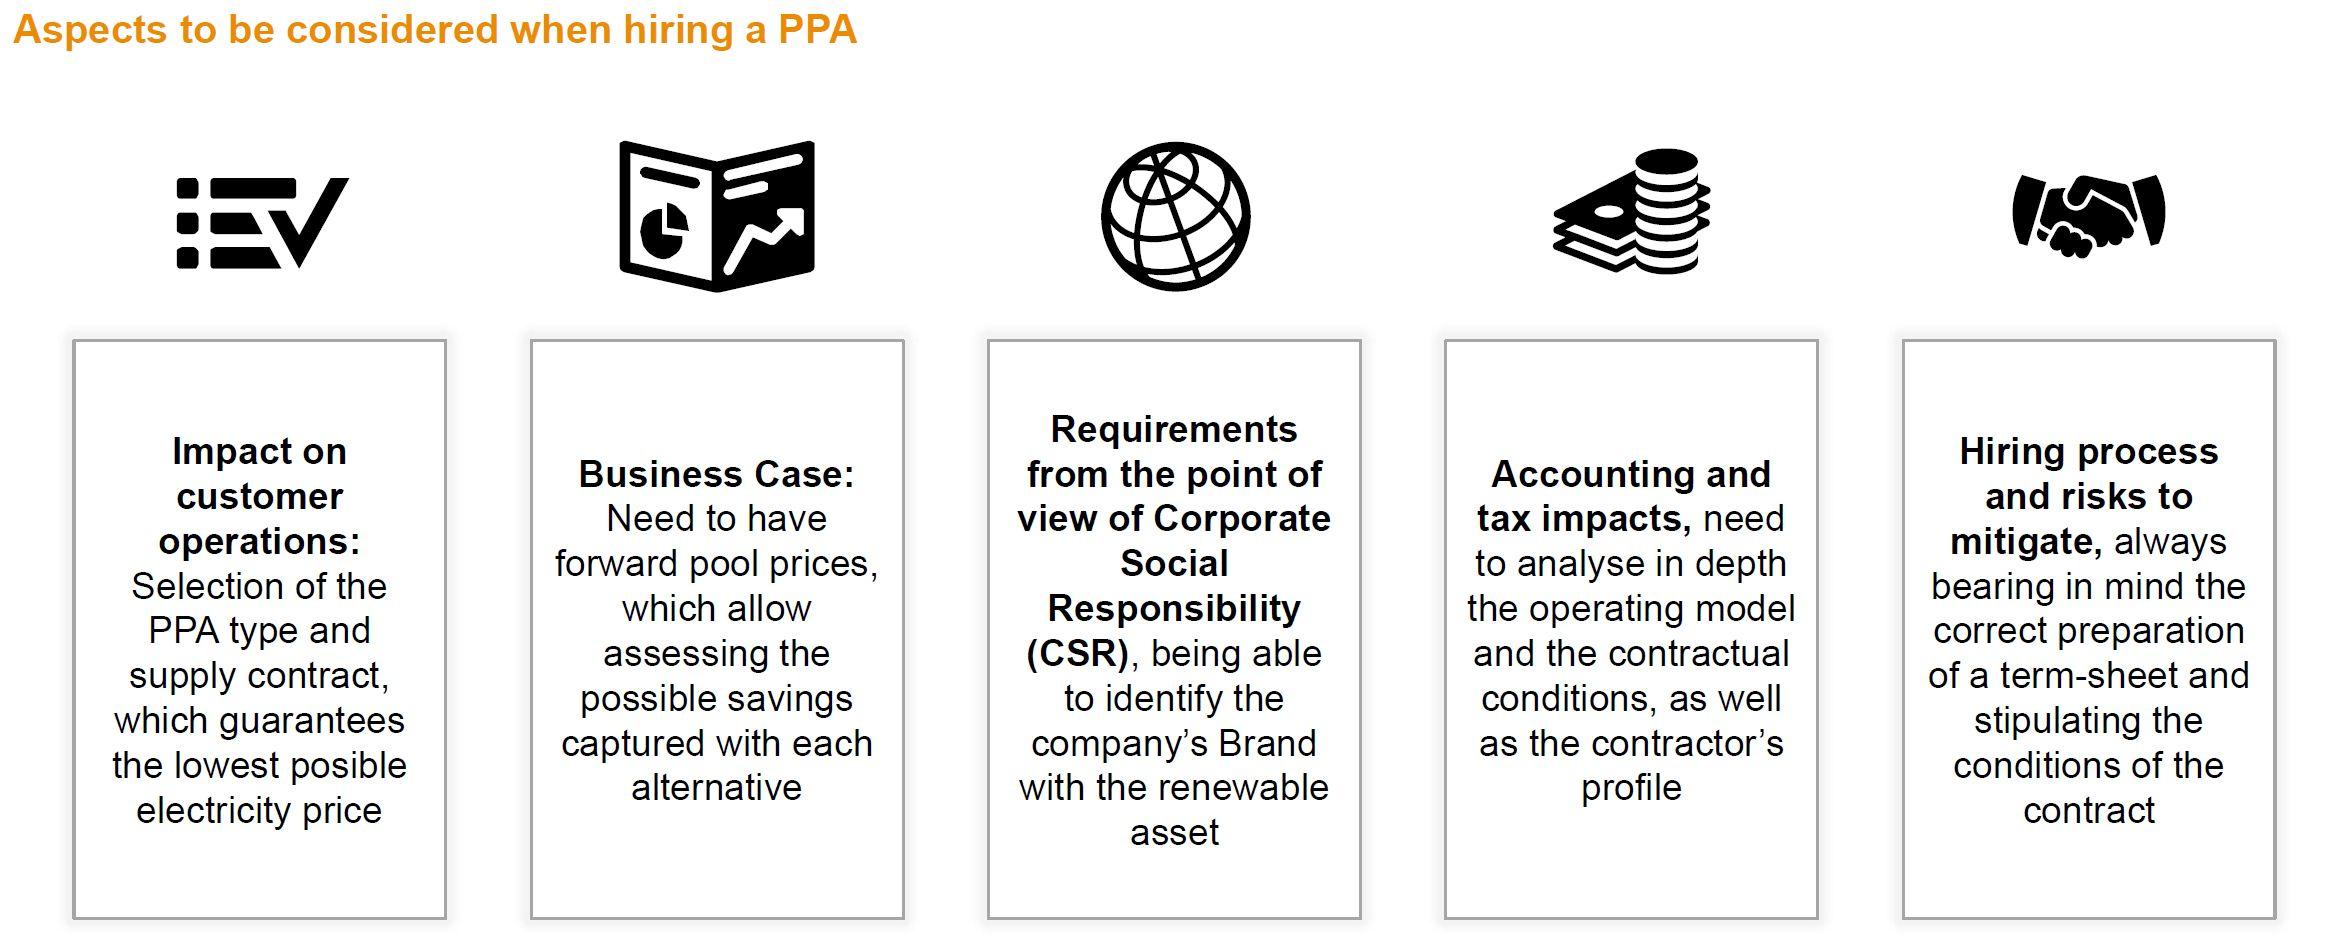 AleaSoft - PPA aspects